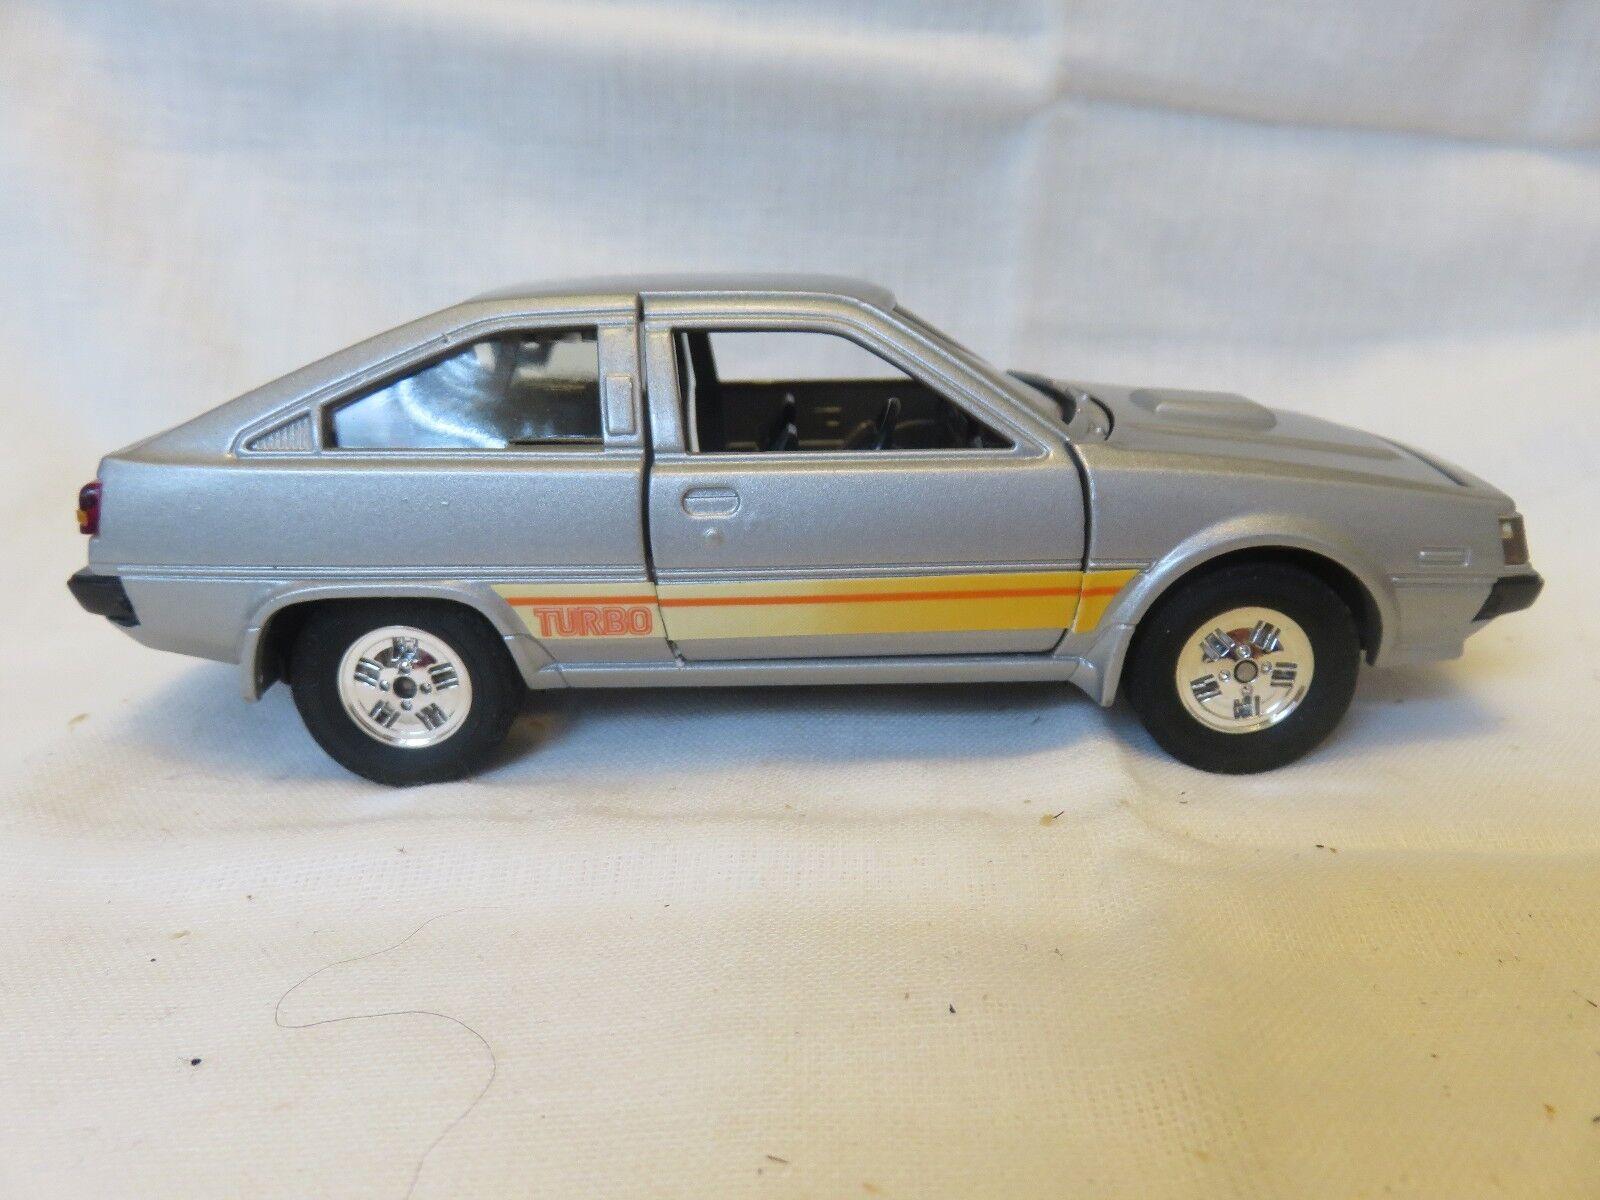 Yonezawa Toys Diapet Mitsubishi Cordia-XP Turbo 1  28 G-12  01605 Silver